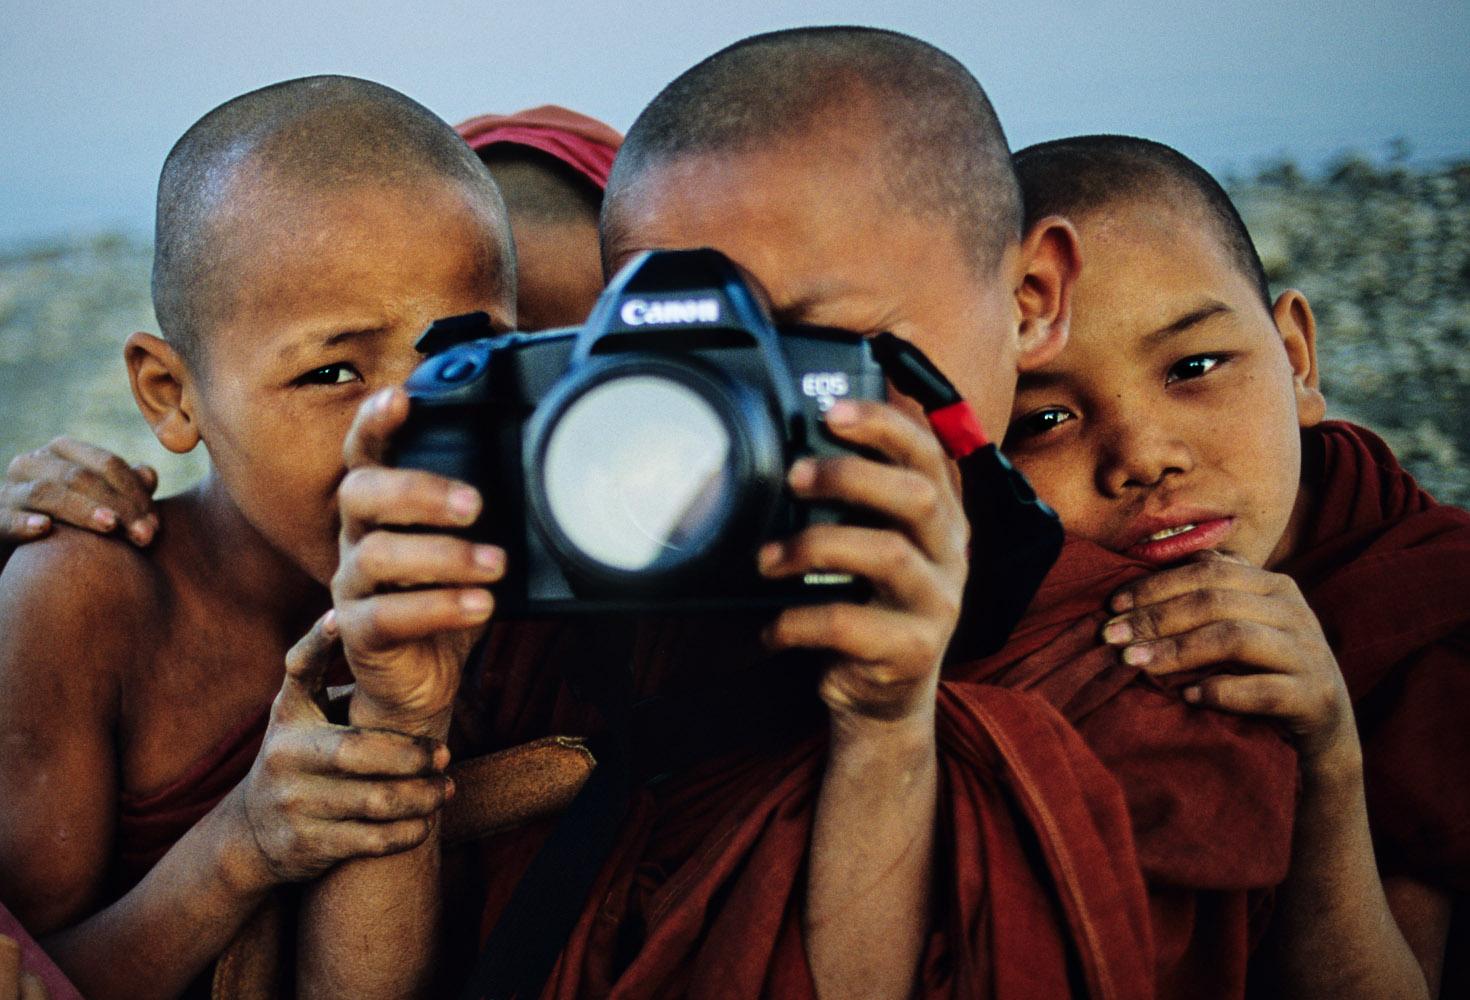 Mingun, Burma